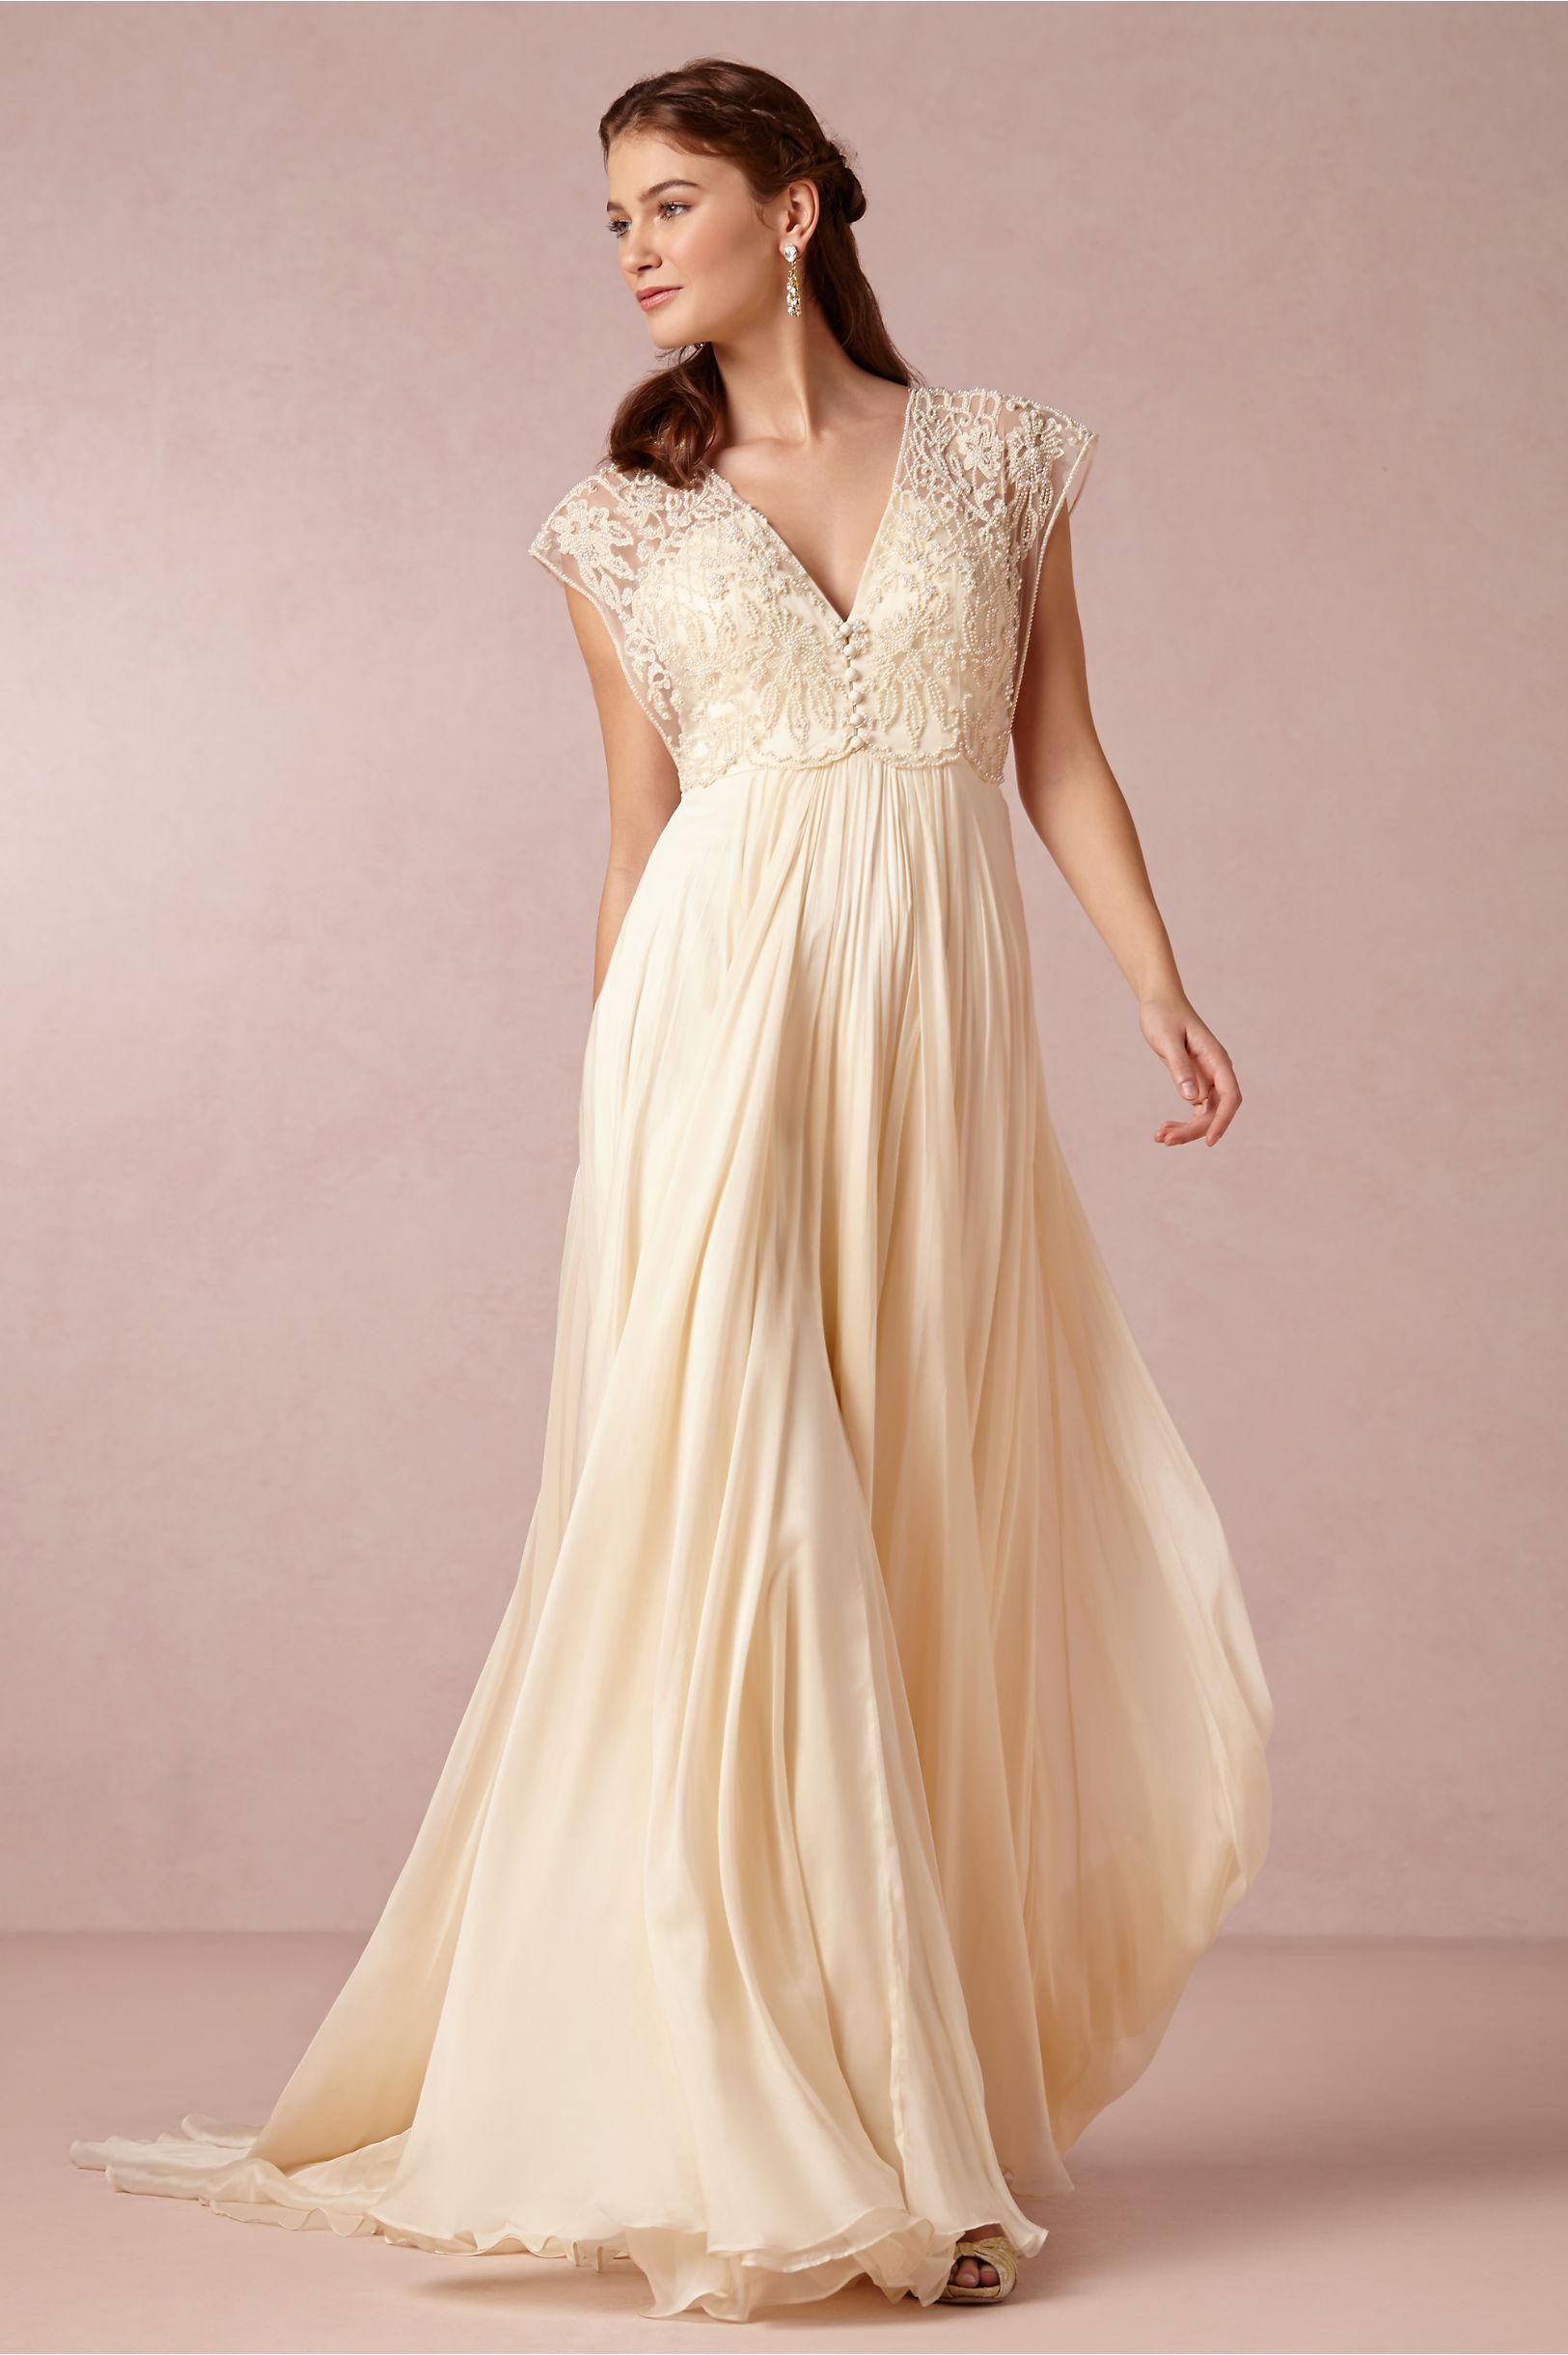 Introducing PomPon   Plum Pretty Sugar Bridesmaid Robes